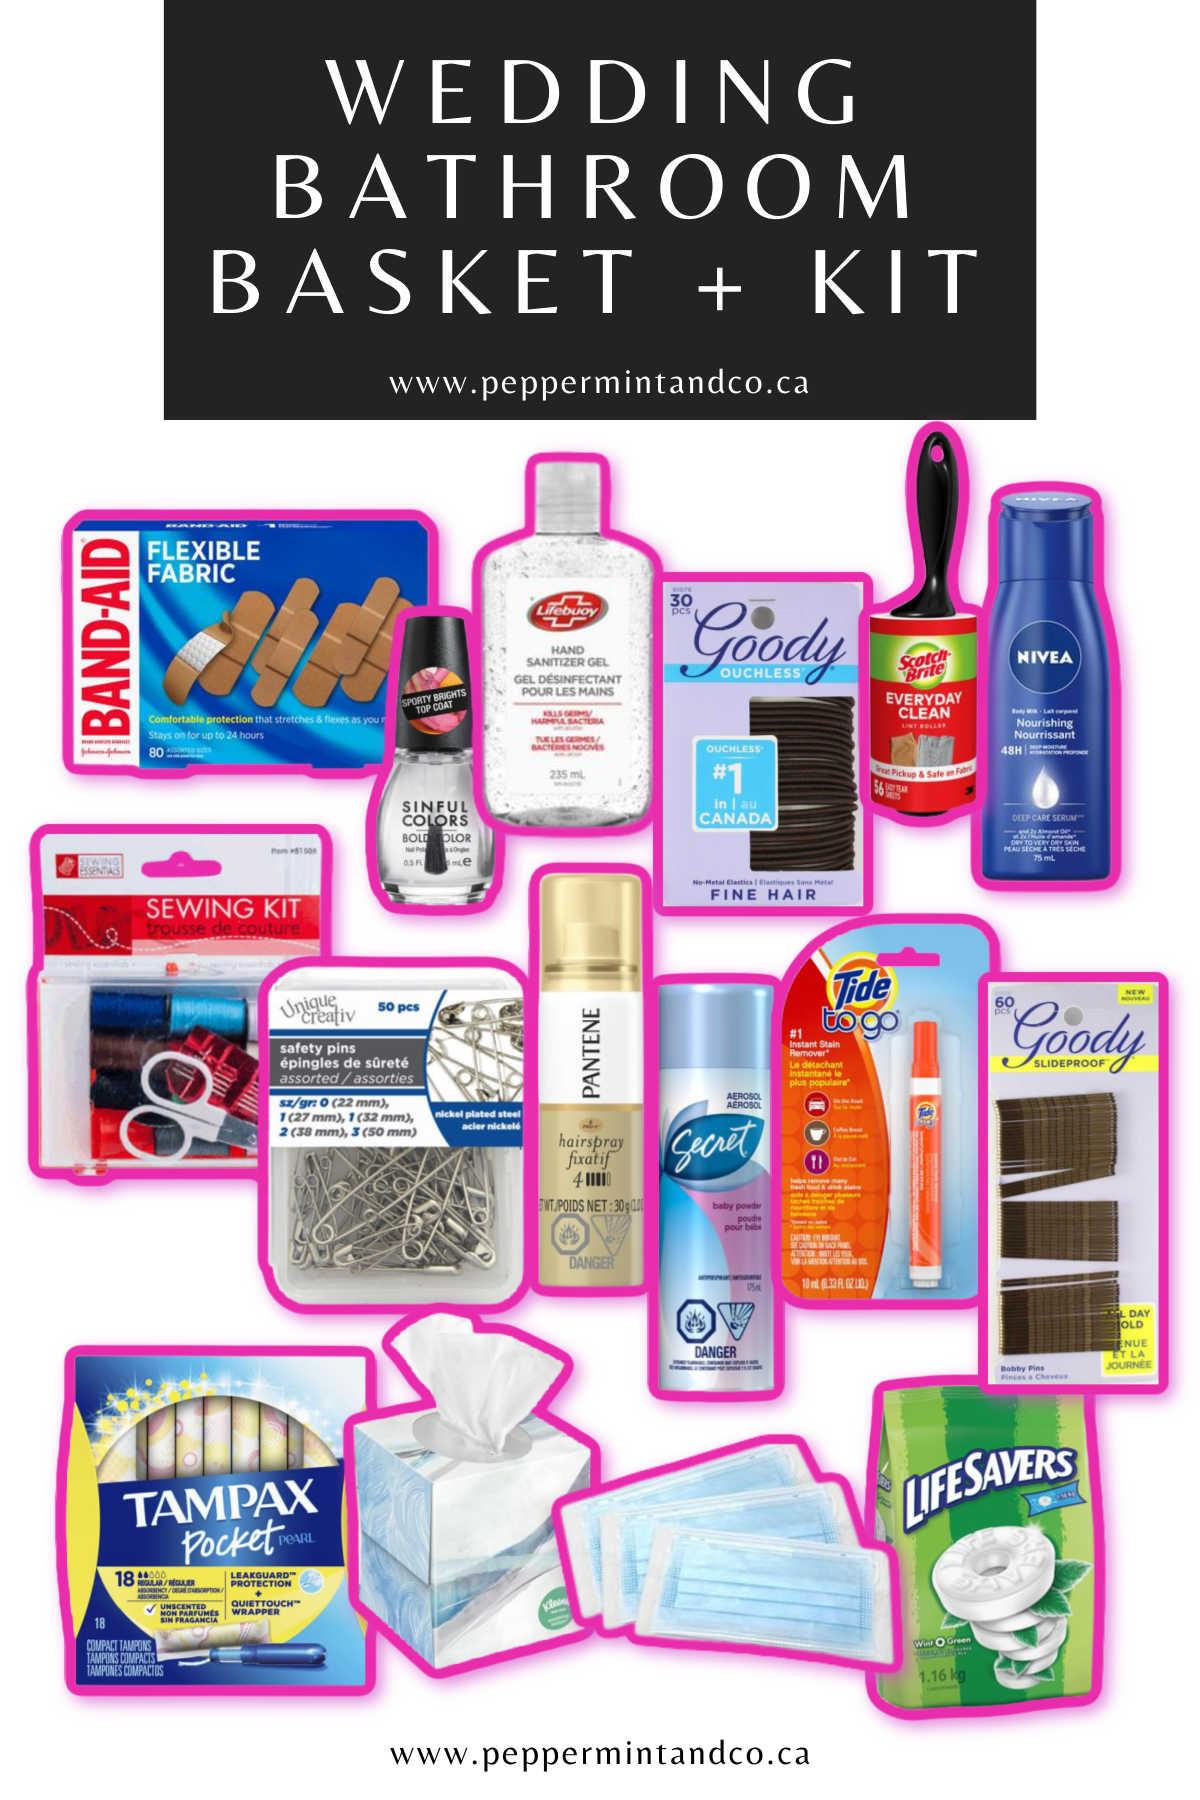 Wedding Bathroom Basket + Kit Guide